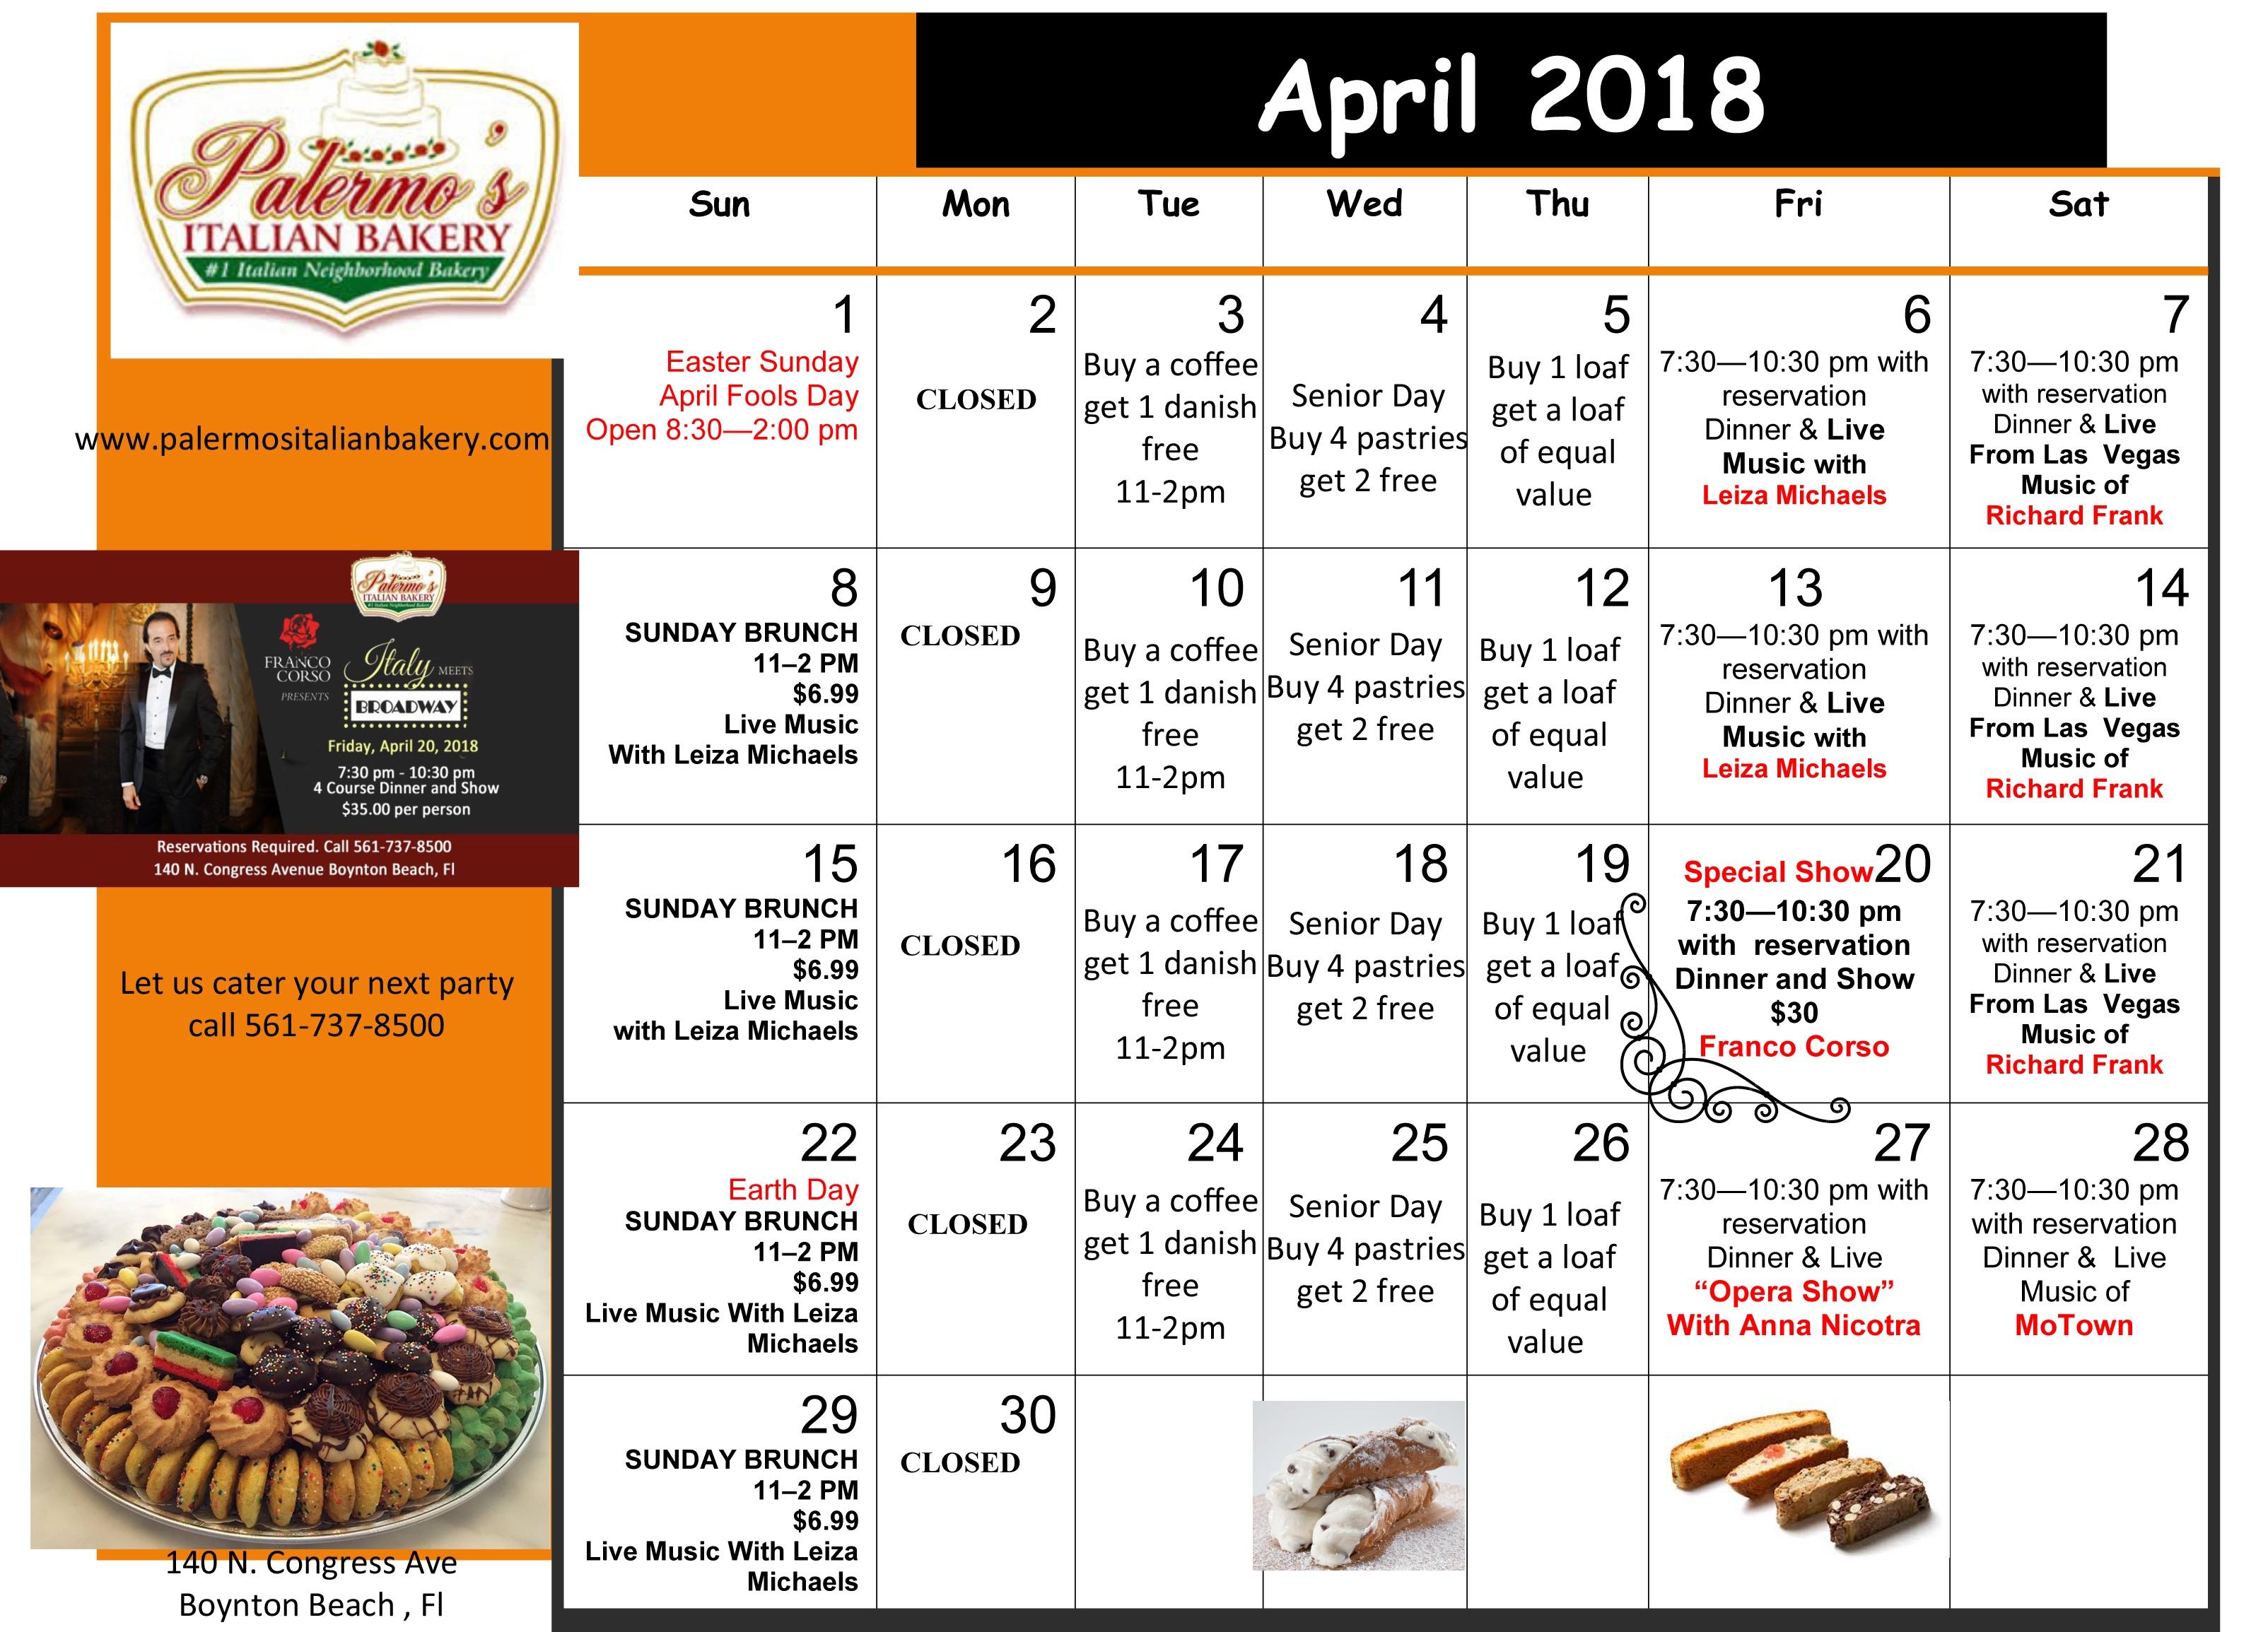 April Performance Schedule